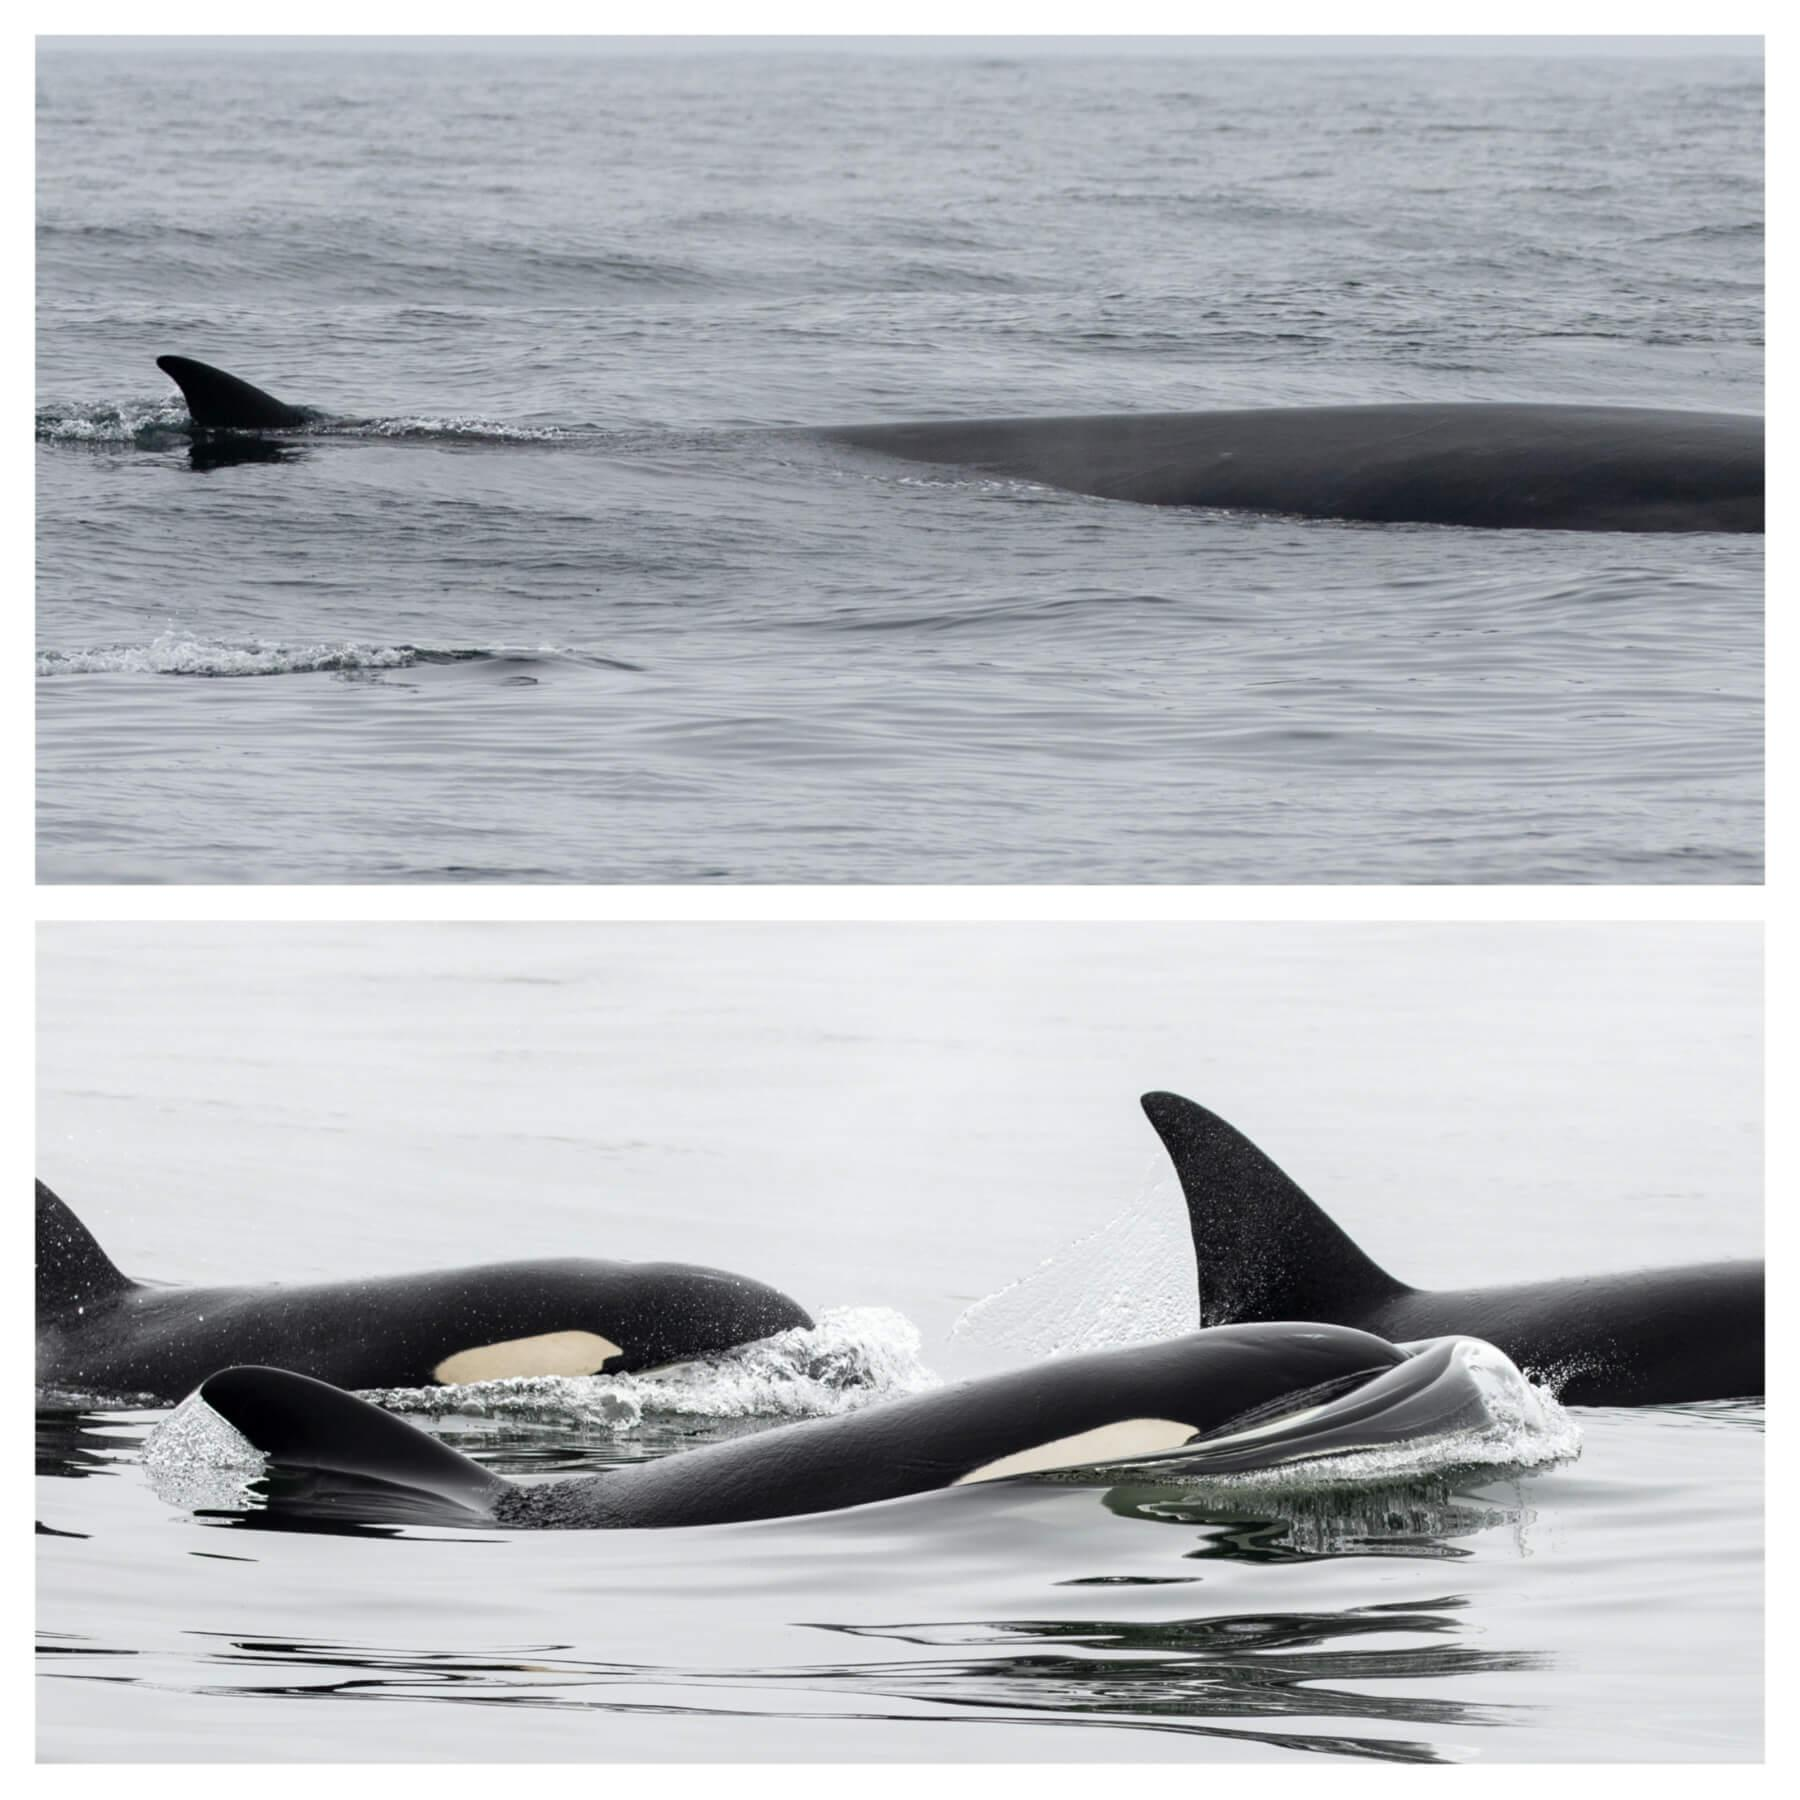 Fin whale (top), killer whales (bottom). © Chris Biertuempfel